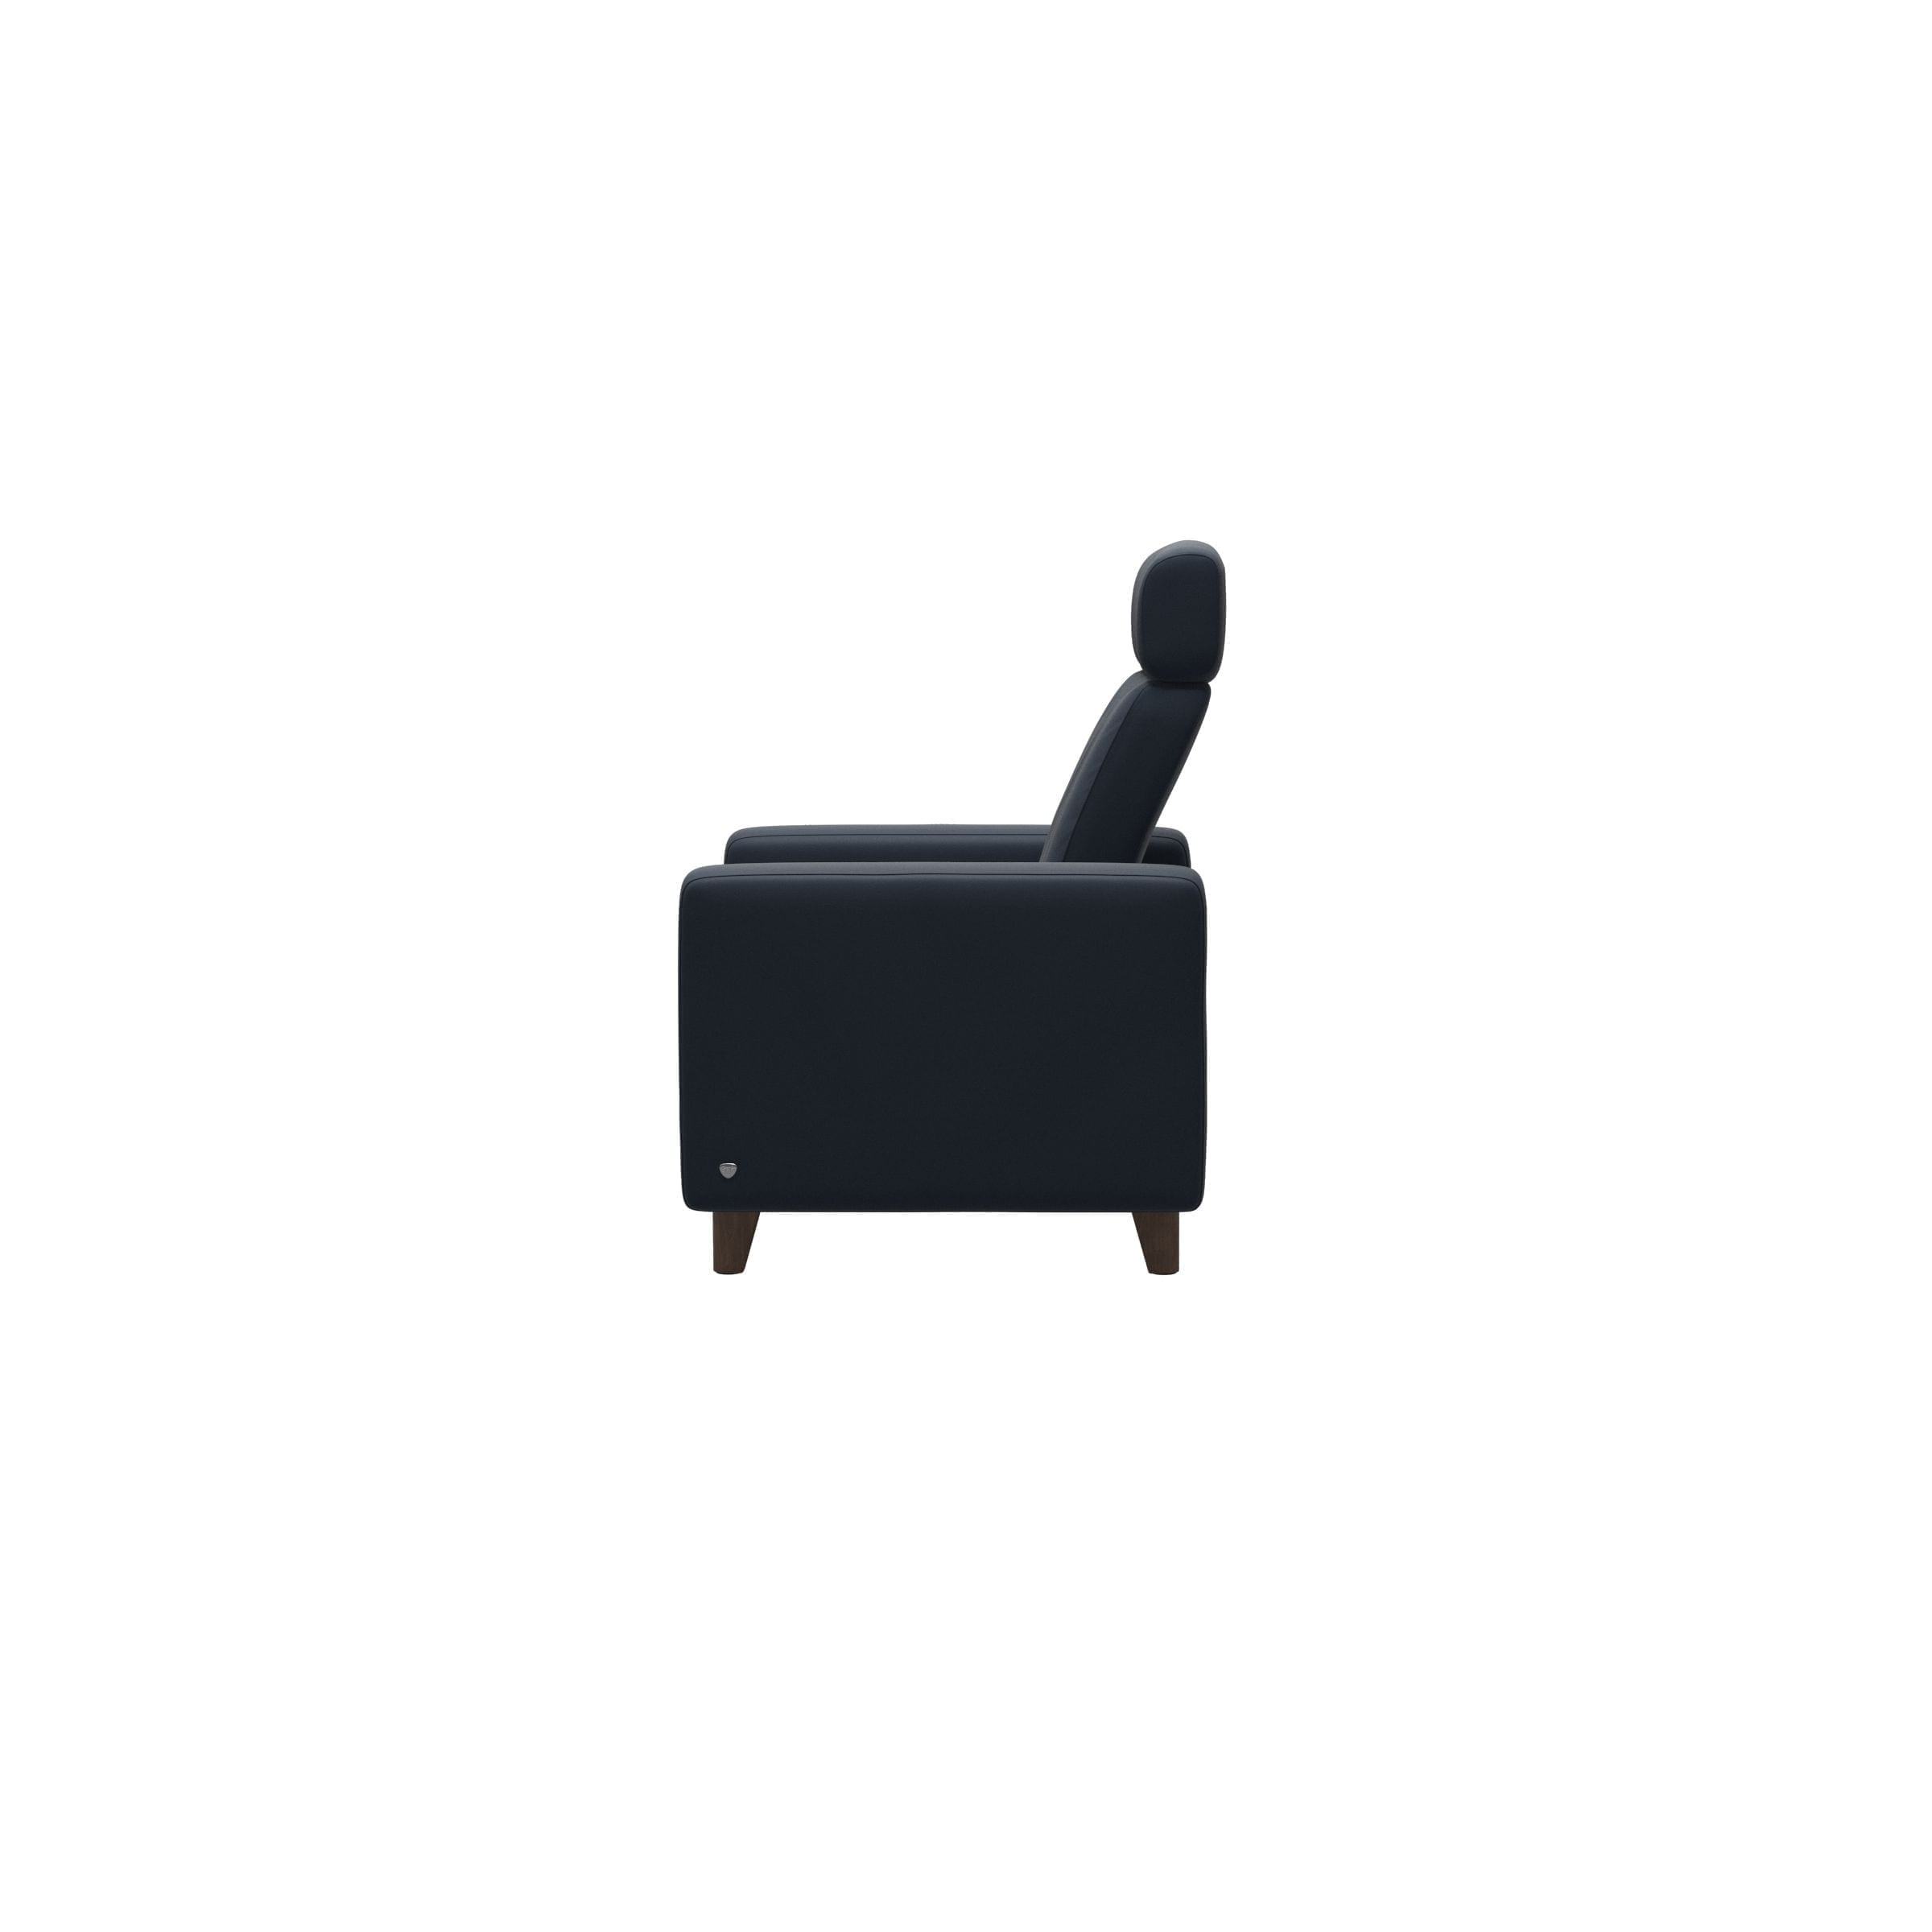 Arion 19 A20 Stressless High Back Chair 2